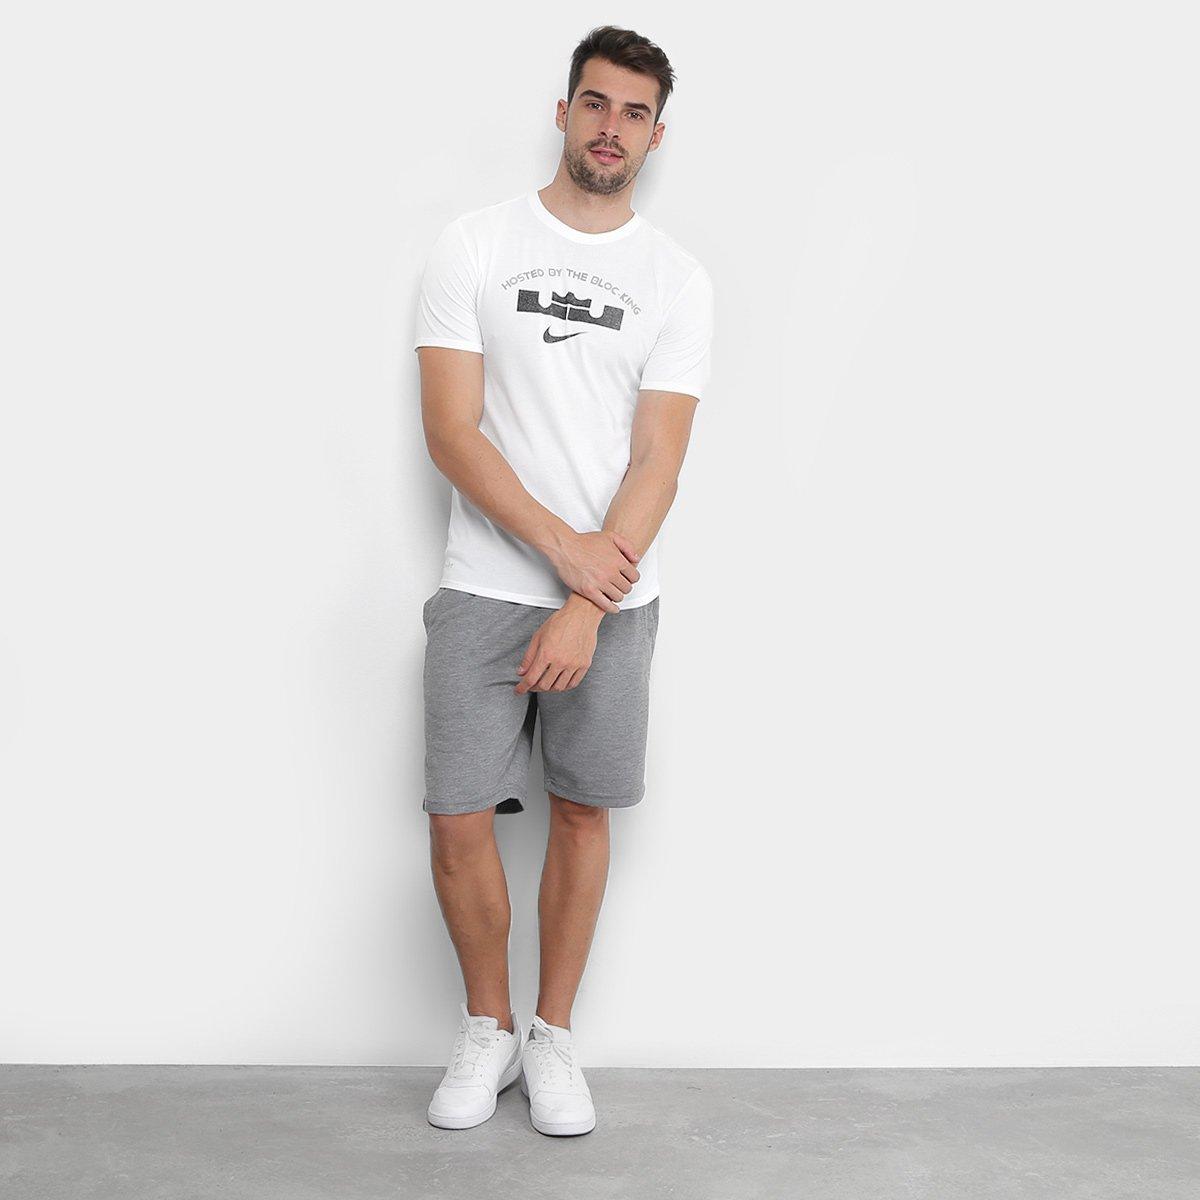 69bfc6b68b Camiseta Nike Lebron James Block Masculina - Branco - Compre Agora ...